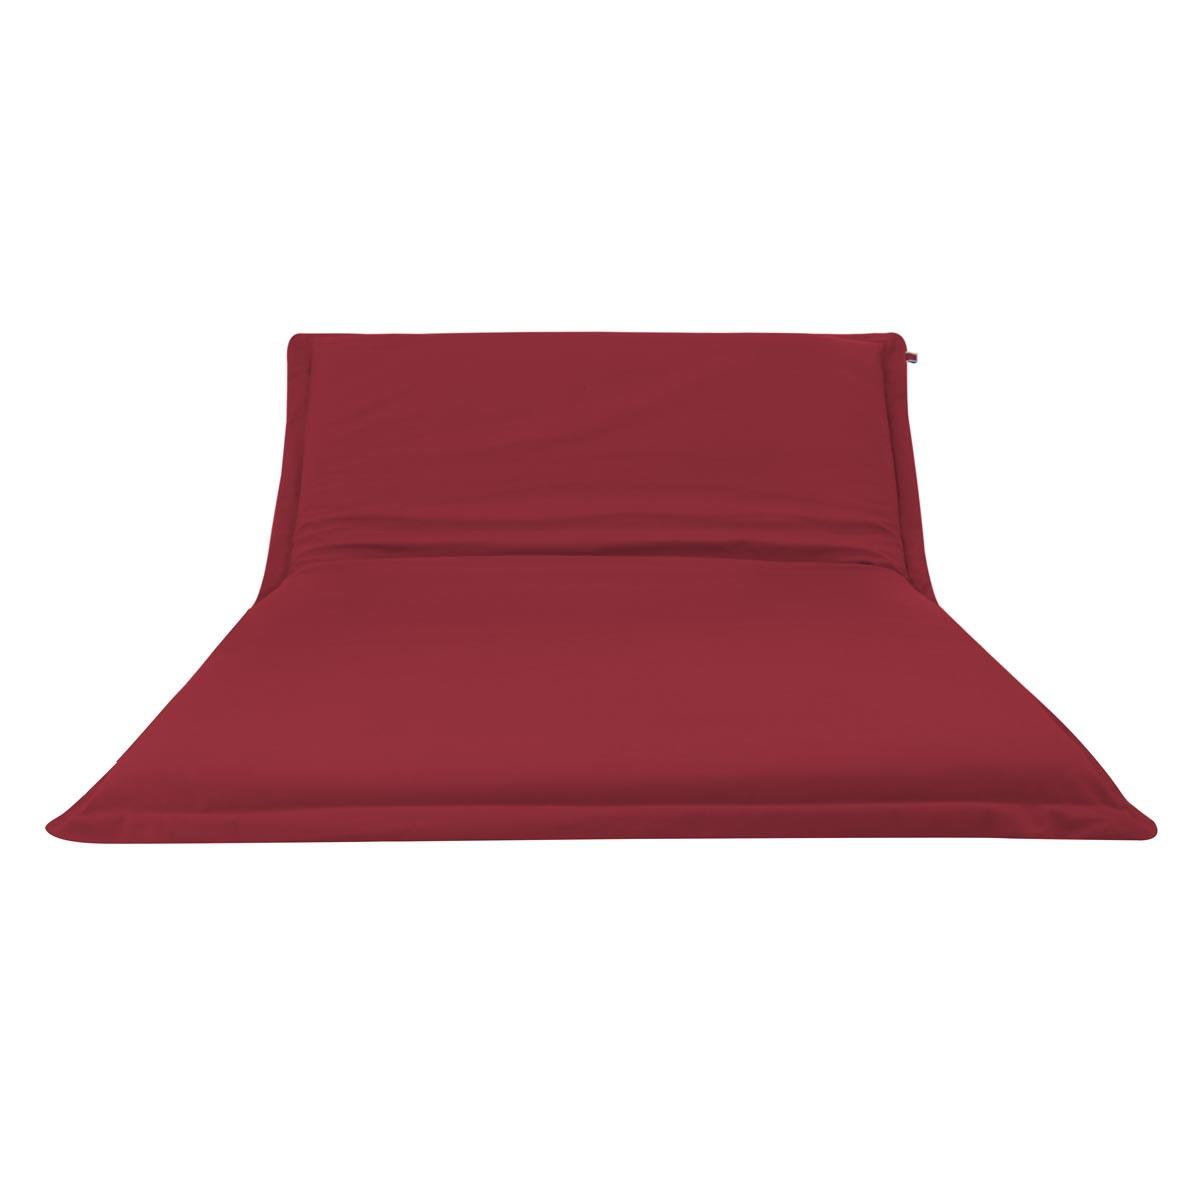 Pufe ClicClac Duo Lounge Tecido LN03 Vermelho 01 02